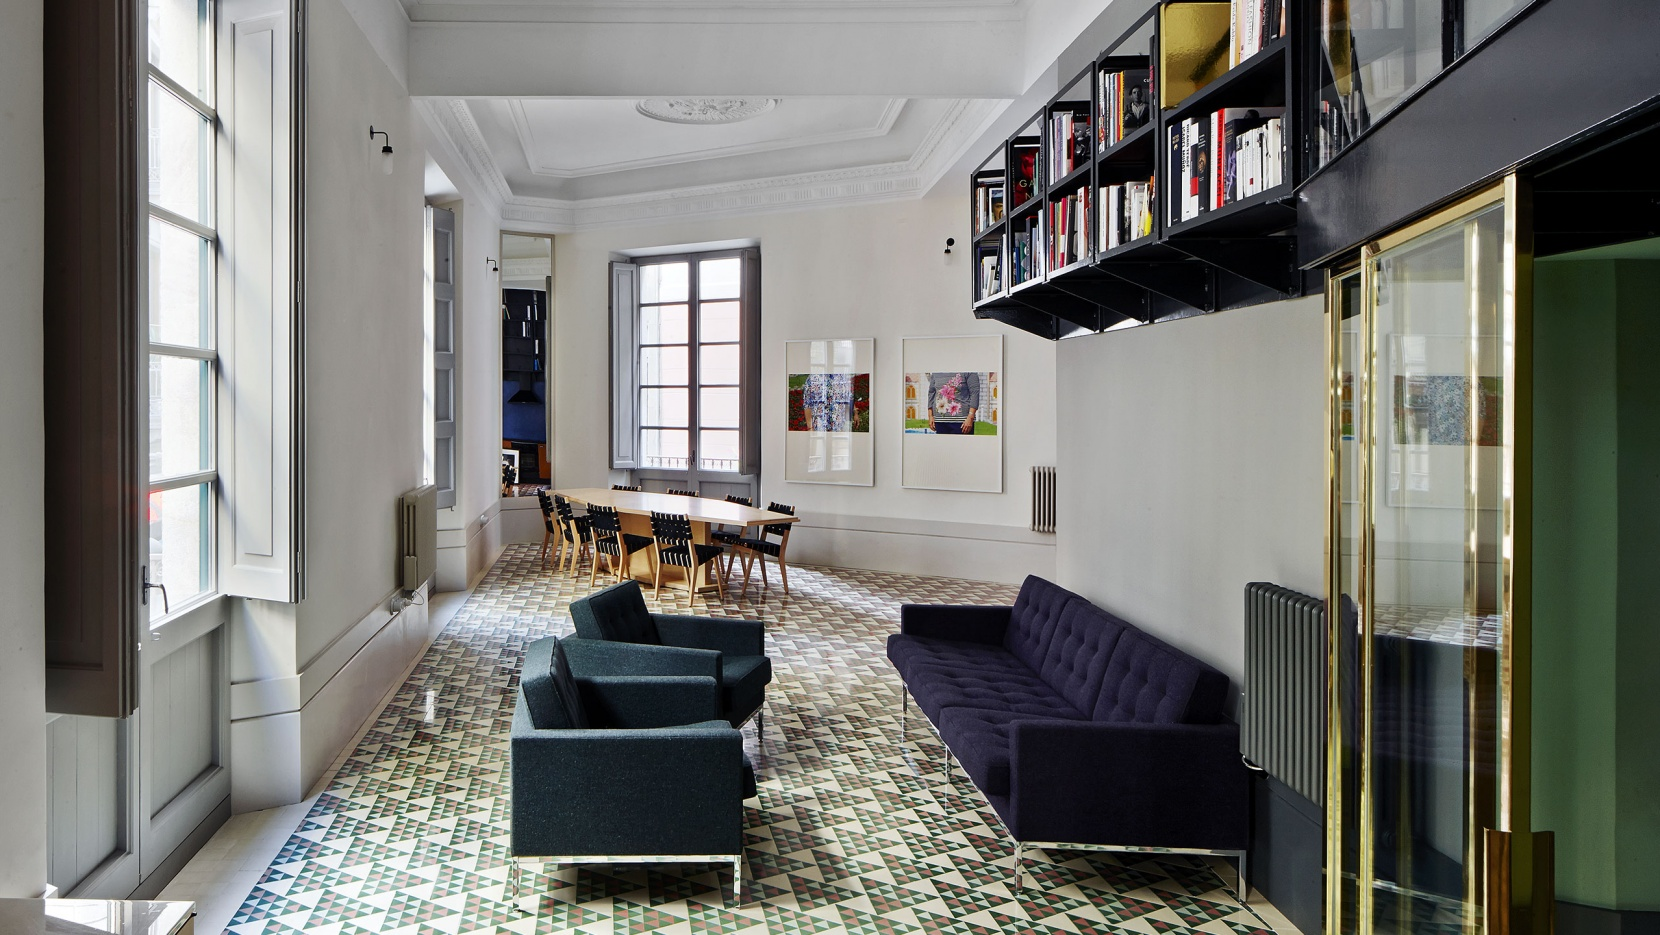 the carrer aviny apartment by david kohn architects in barcelona rh yatzer com